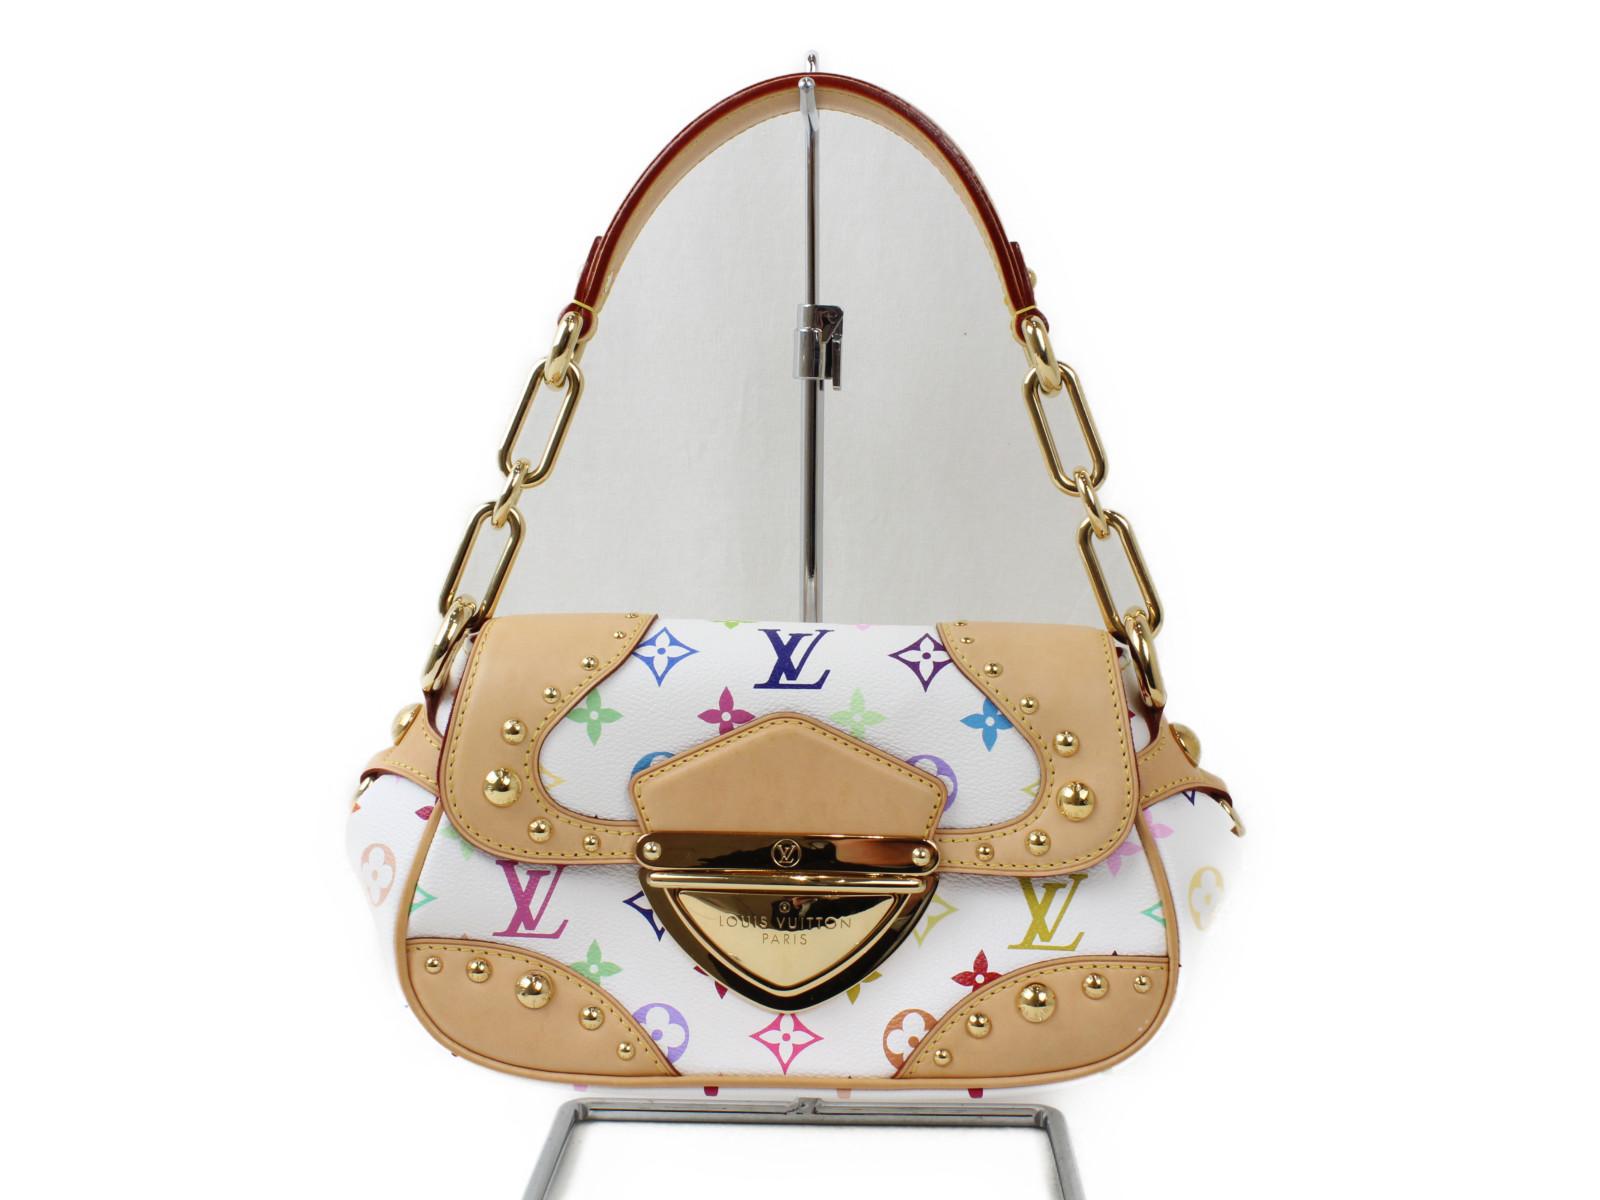 LOUIS VUITTON ルイヴィトンマリリン M40127マルチカラー ハンドバッグ コンパクトカワイイ プレゼント包装可【中古】